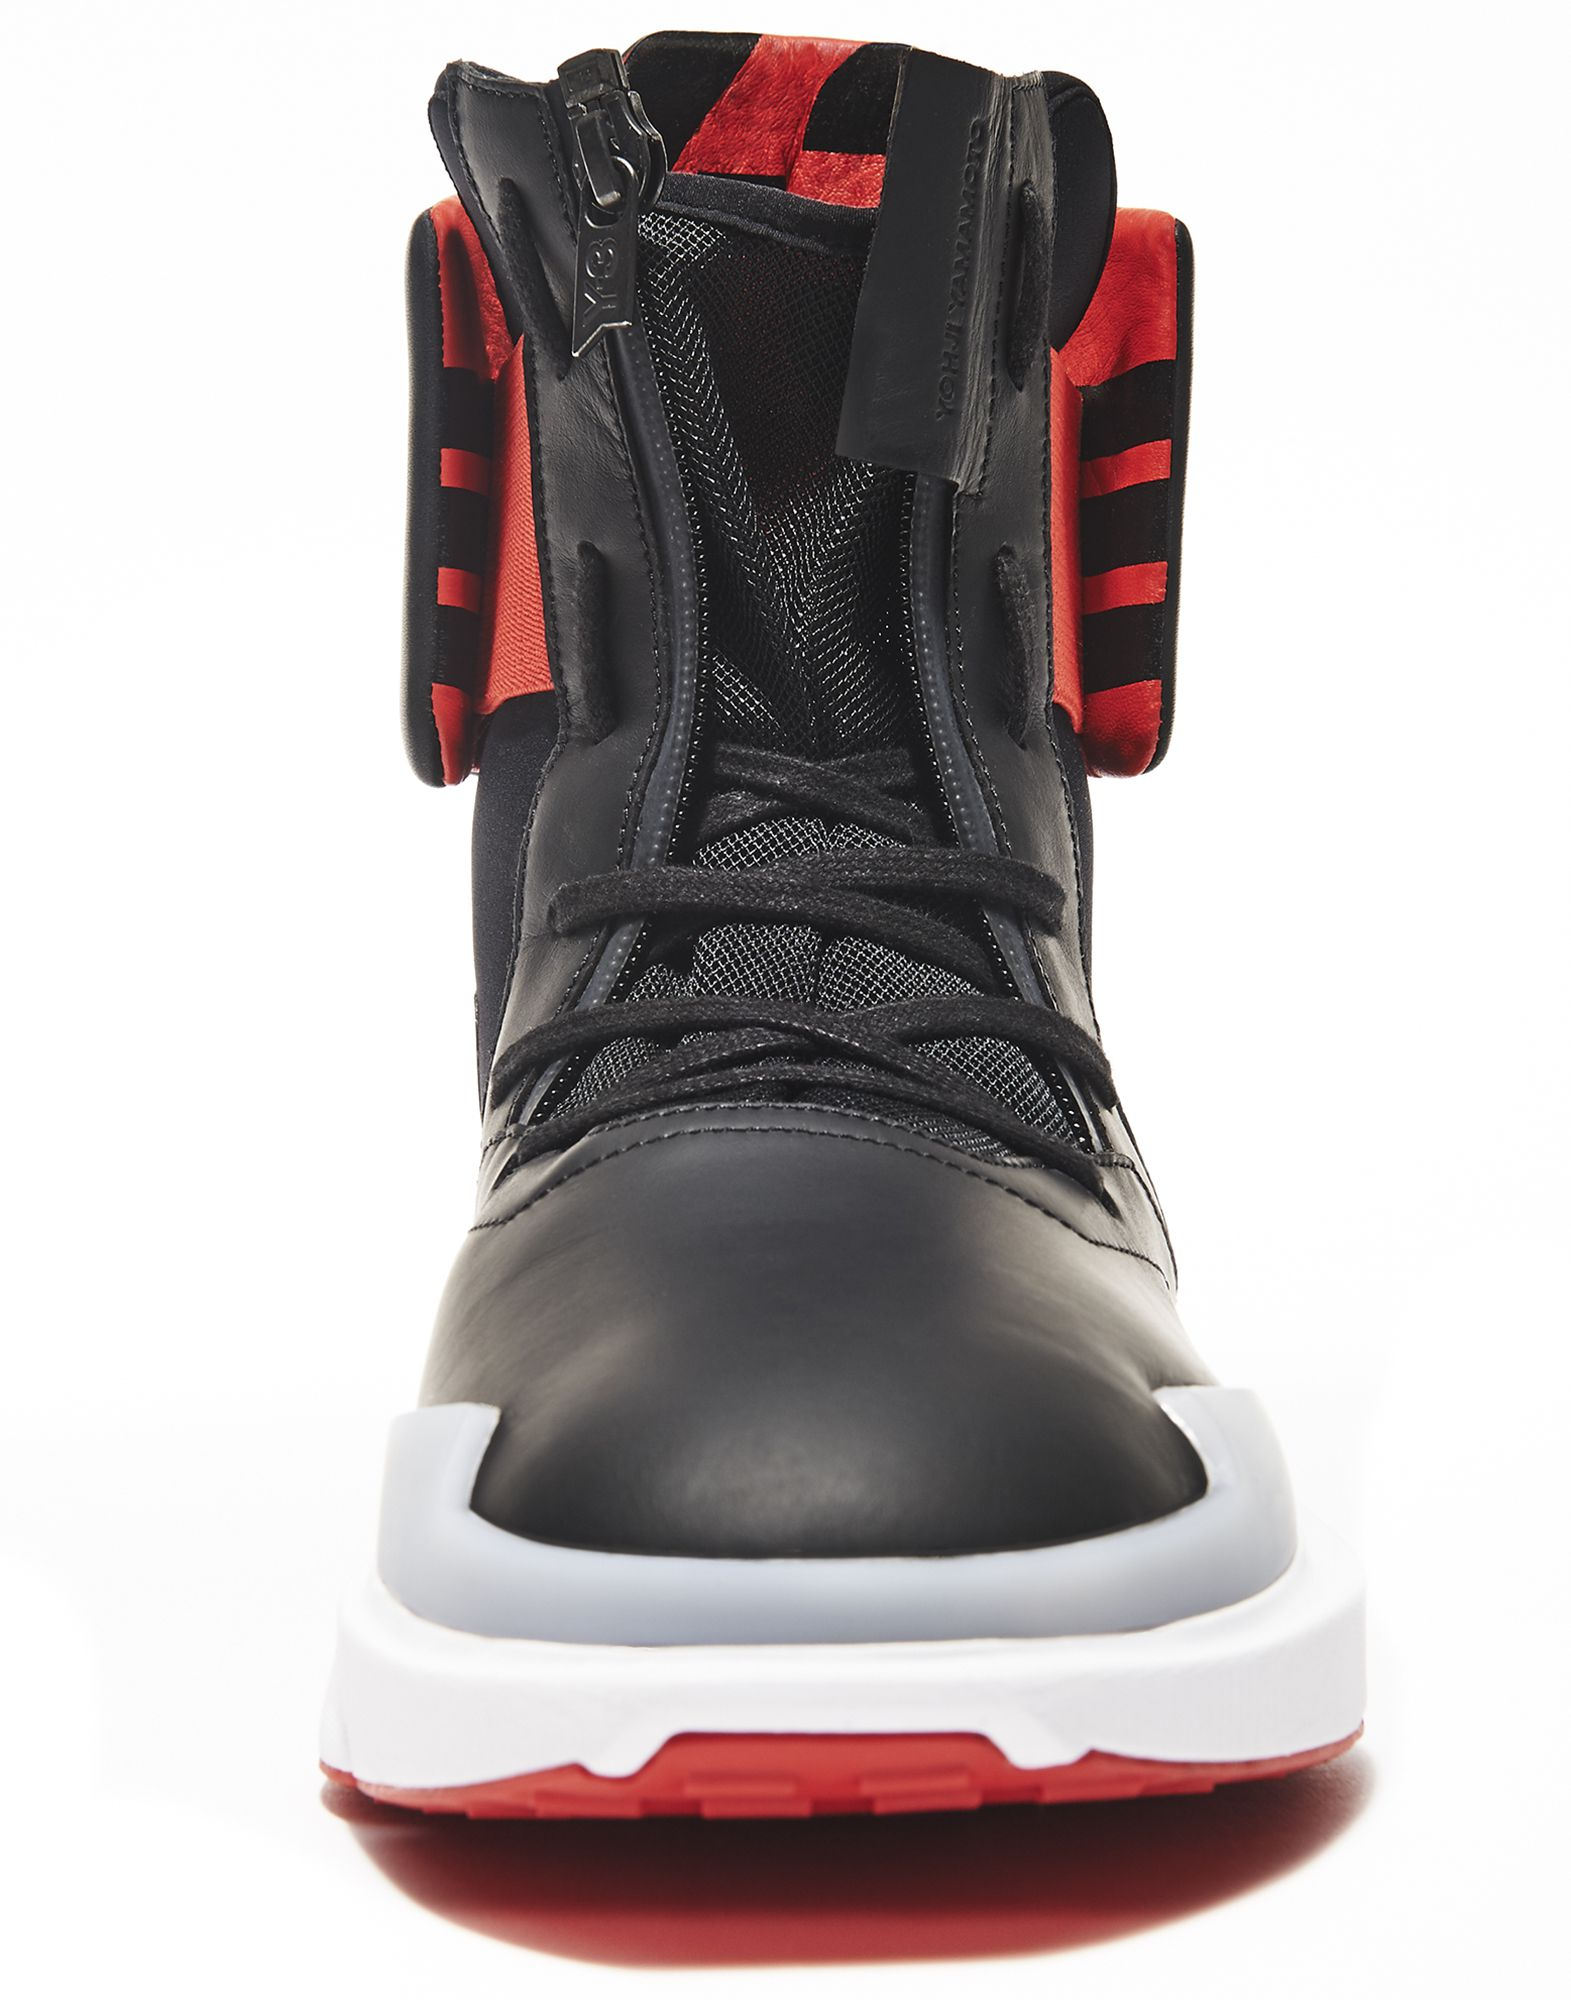 Y-3 Pure Boost ZG Primeknit Adidas AQ5731 black/white